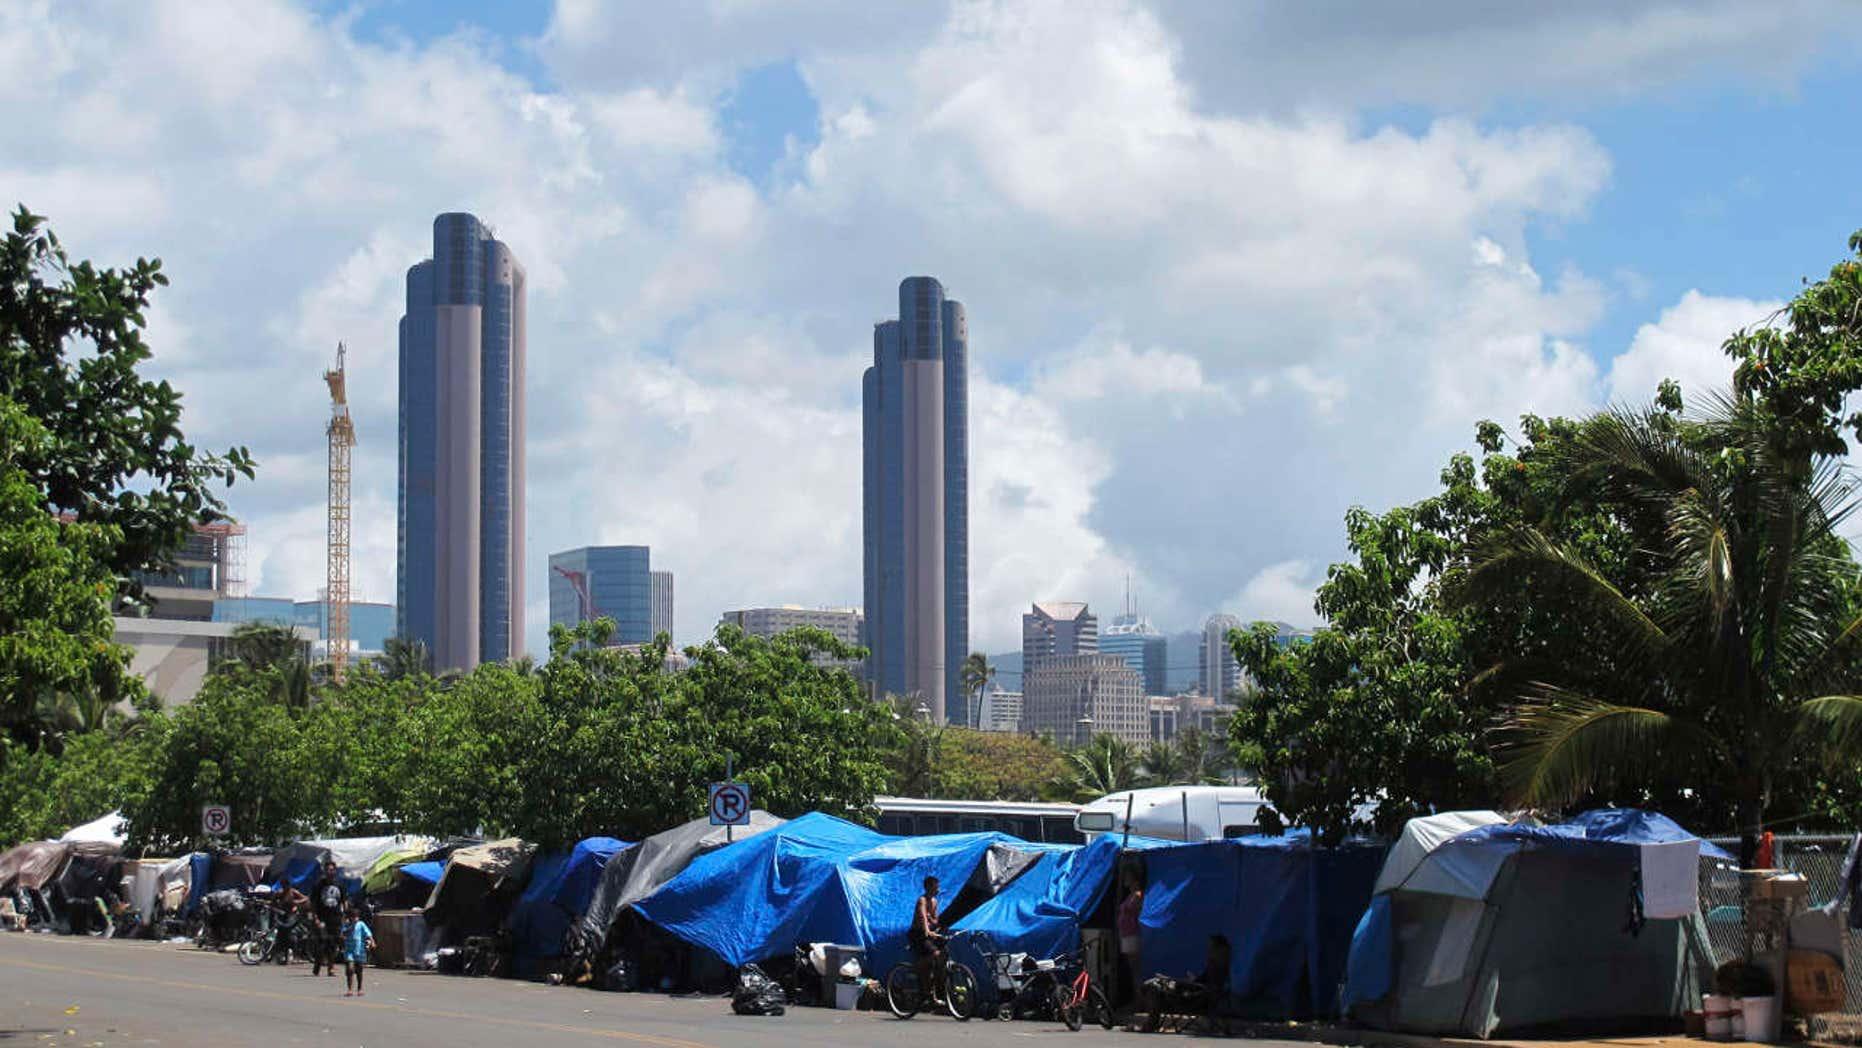 FILE - In this June 30, 2015, file photo, people camp out on a sidewalk in the Kakaako neighborhood of Honolulu, Hawaii.